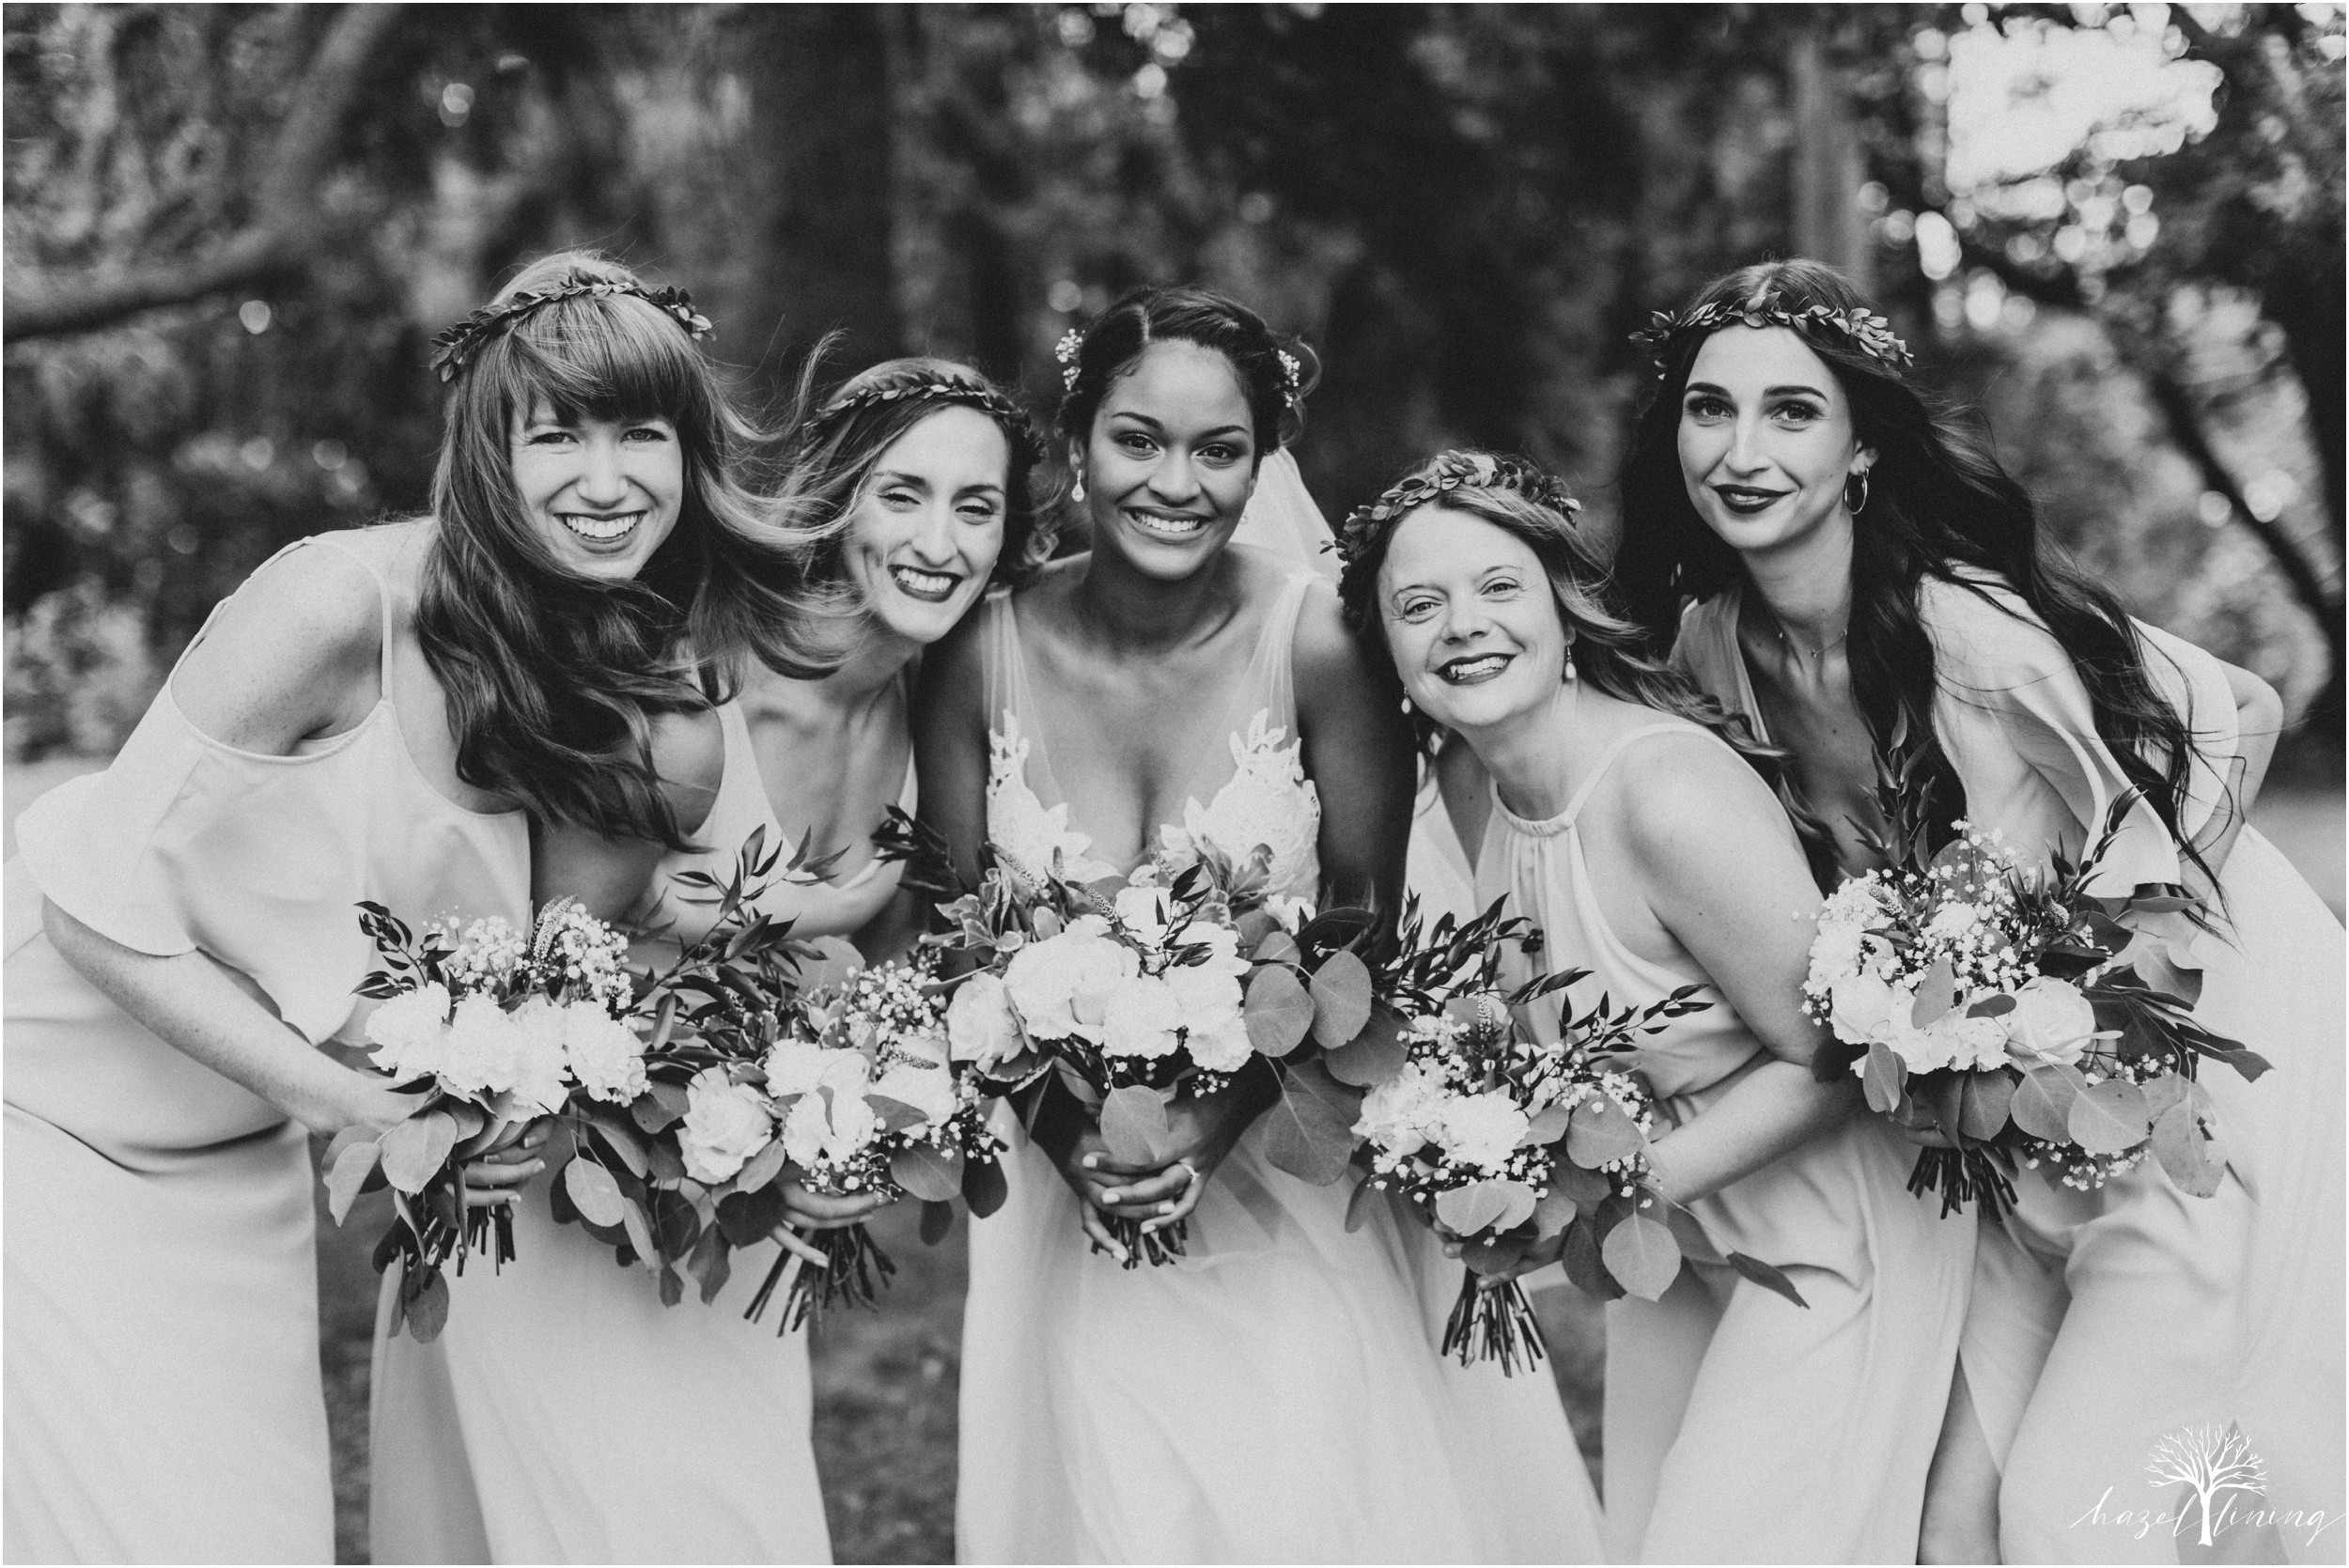 mariah-kreyling-samuel-sherratt-sherrattwiththeworld-peirce-farm-at-witch-hill-boston-massachusetts-wedding-photography-hazel-lining-travel-wedding-elopement-photography_0029.jpg